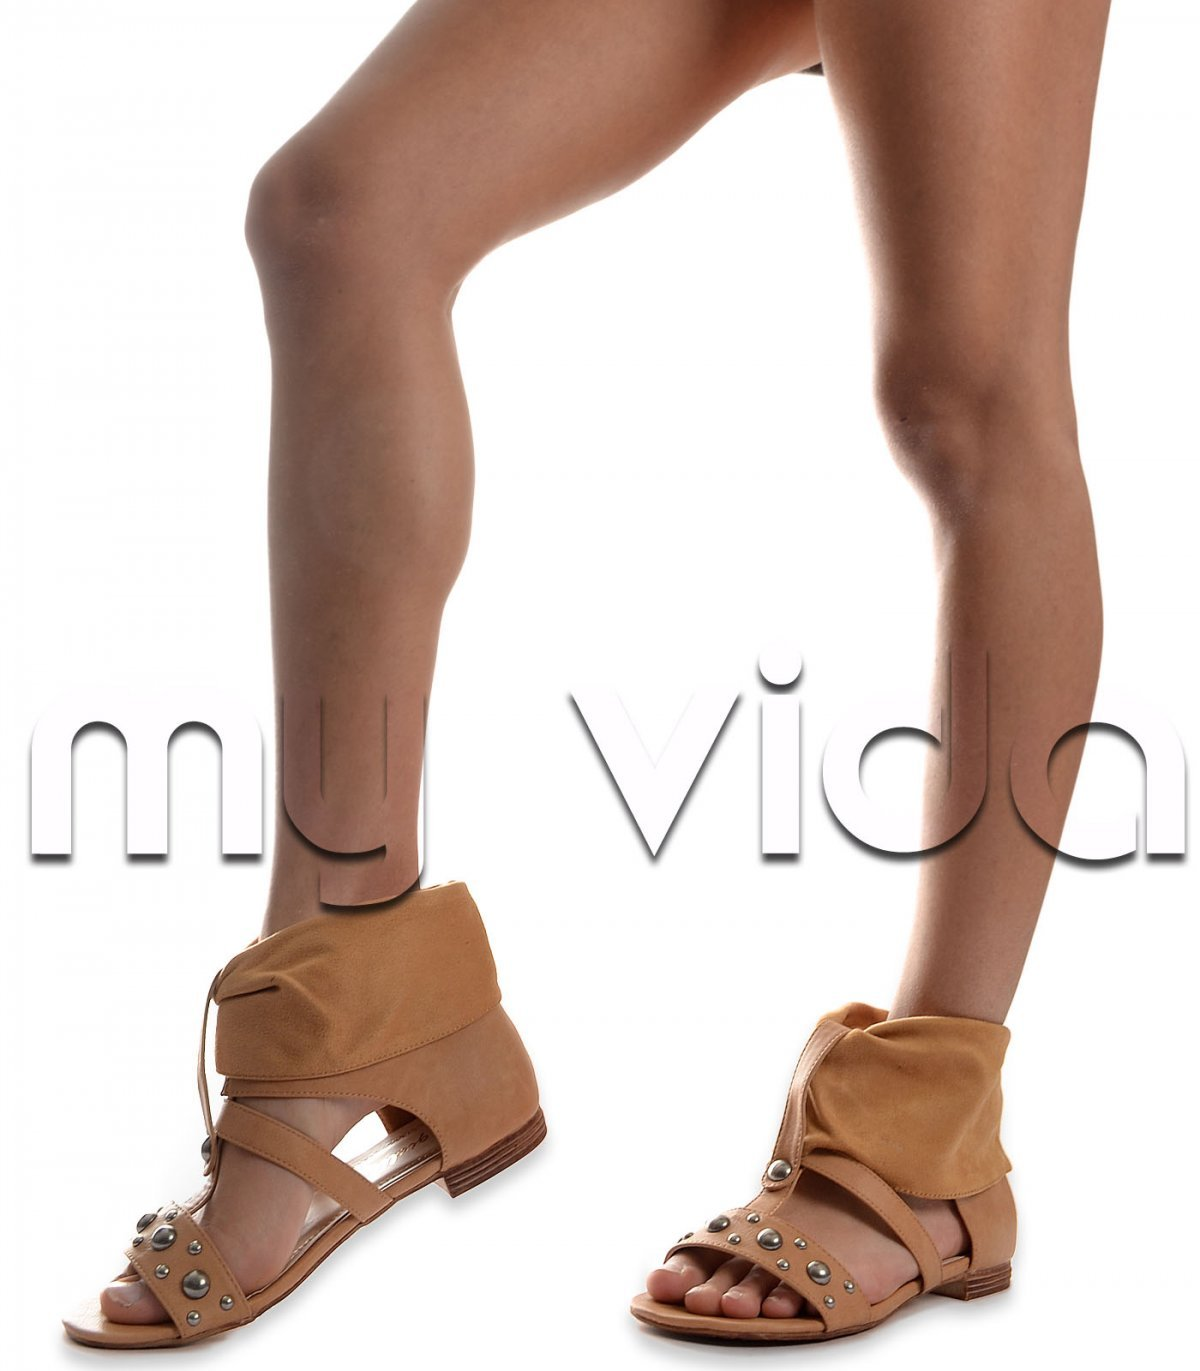 huge discount 2eacb 5a3a5 Sandali donna summer | My Vida